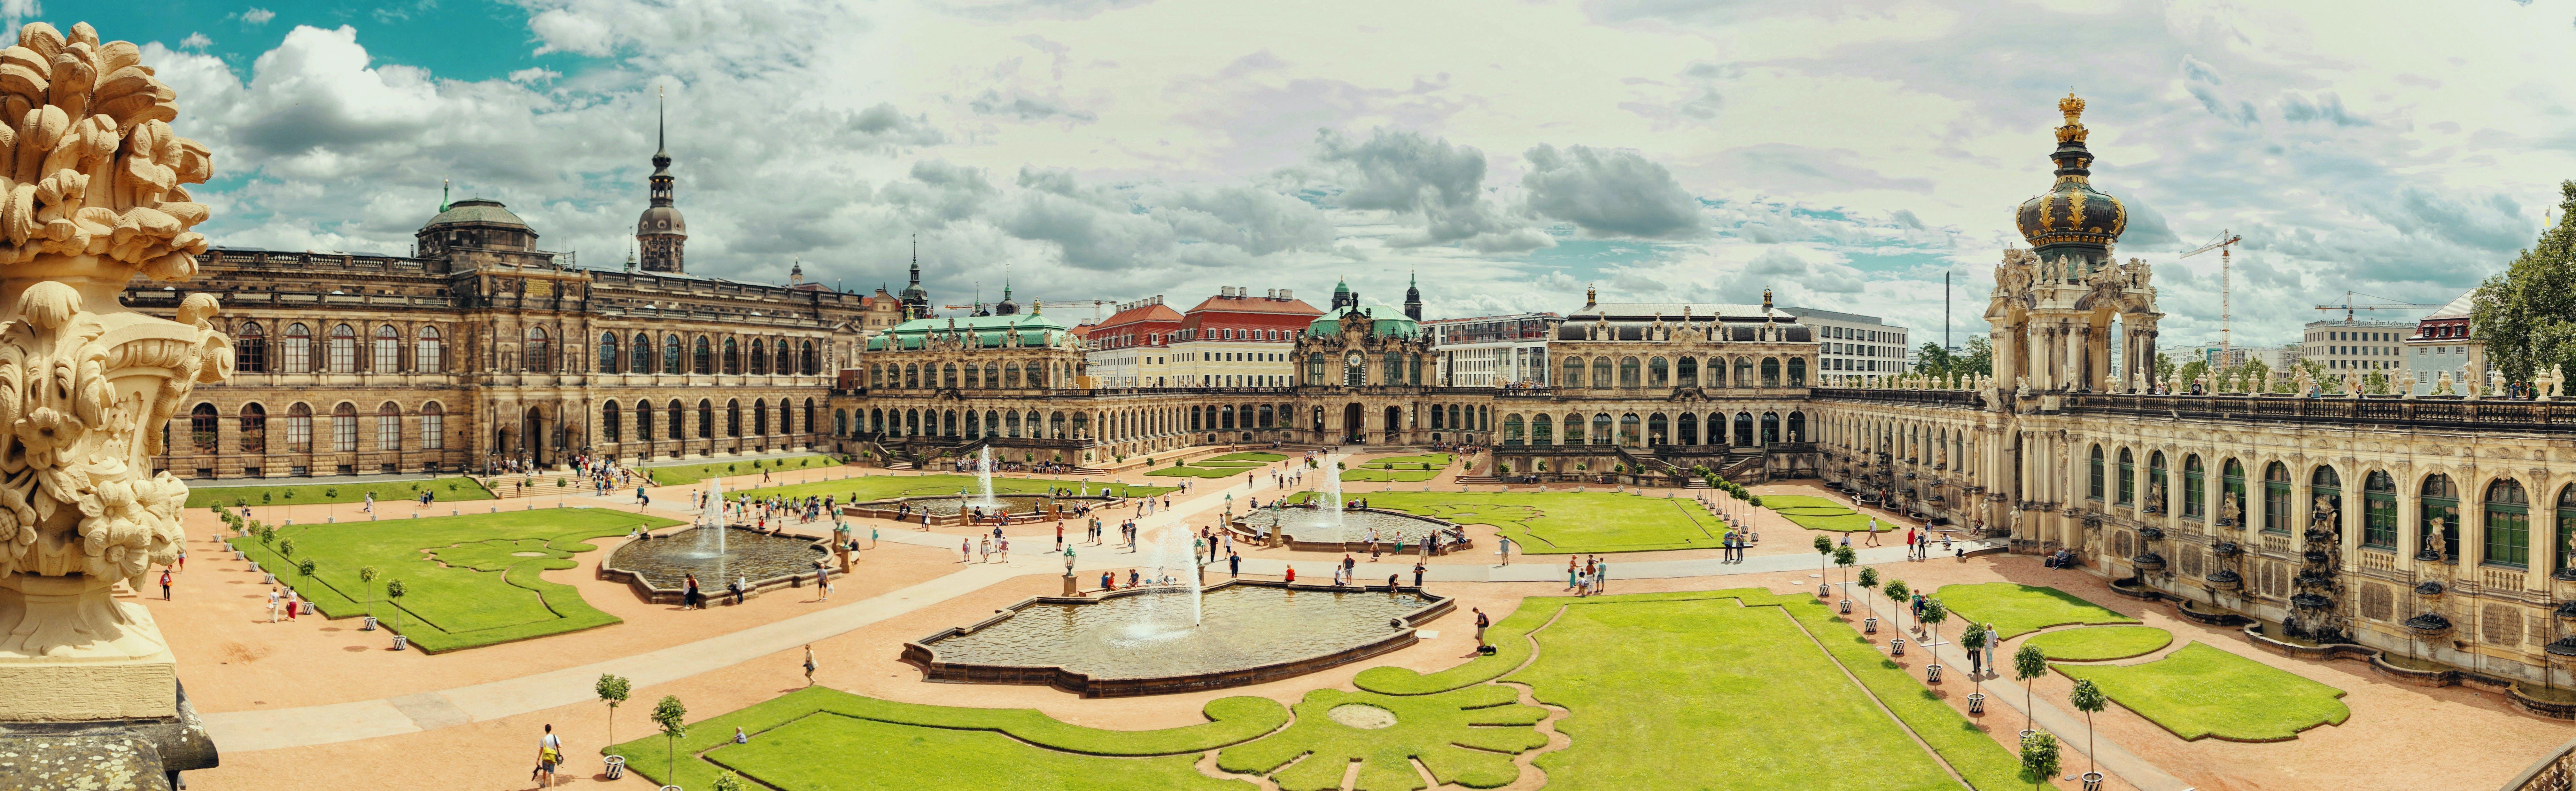 Zwinger Palace Tours Musement